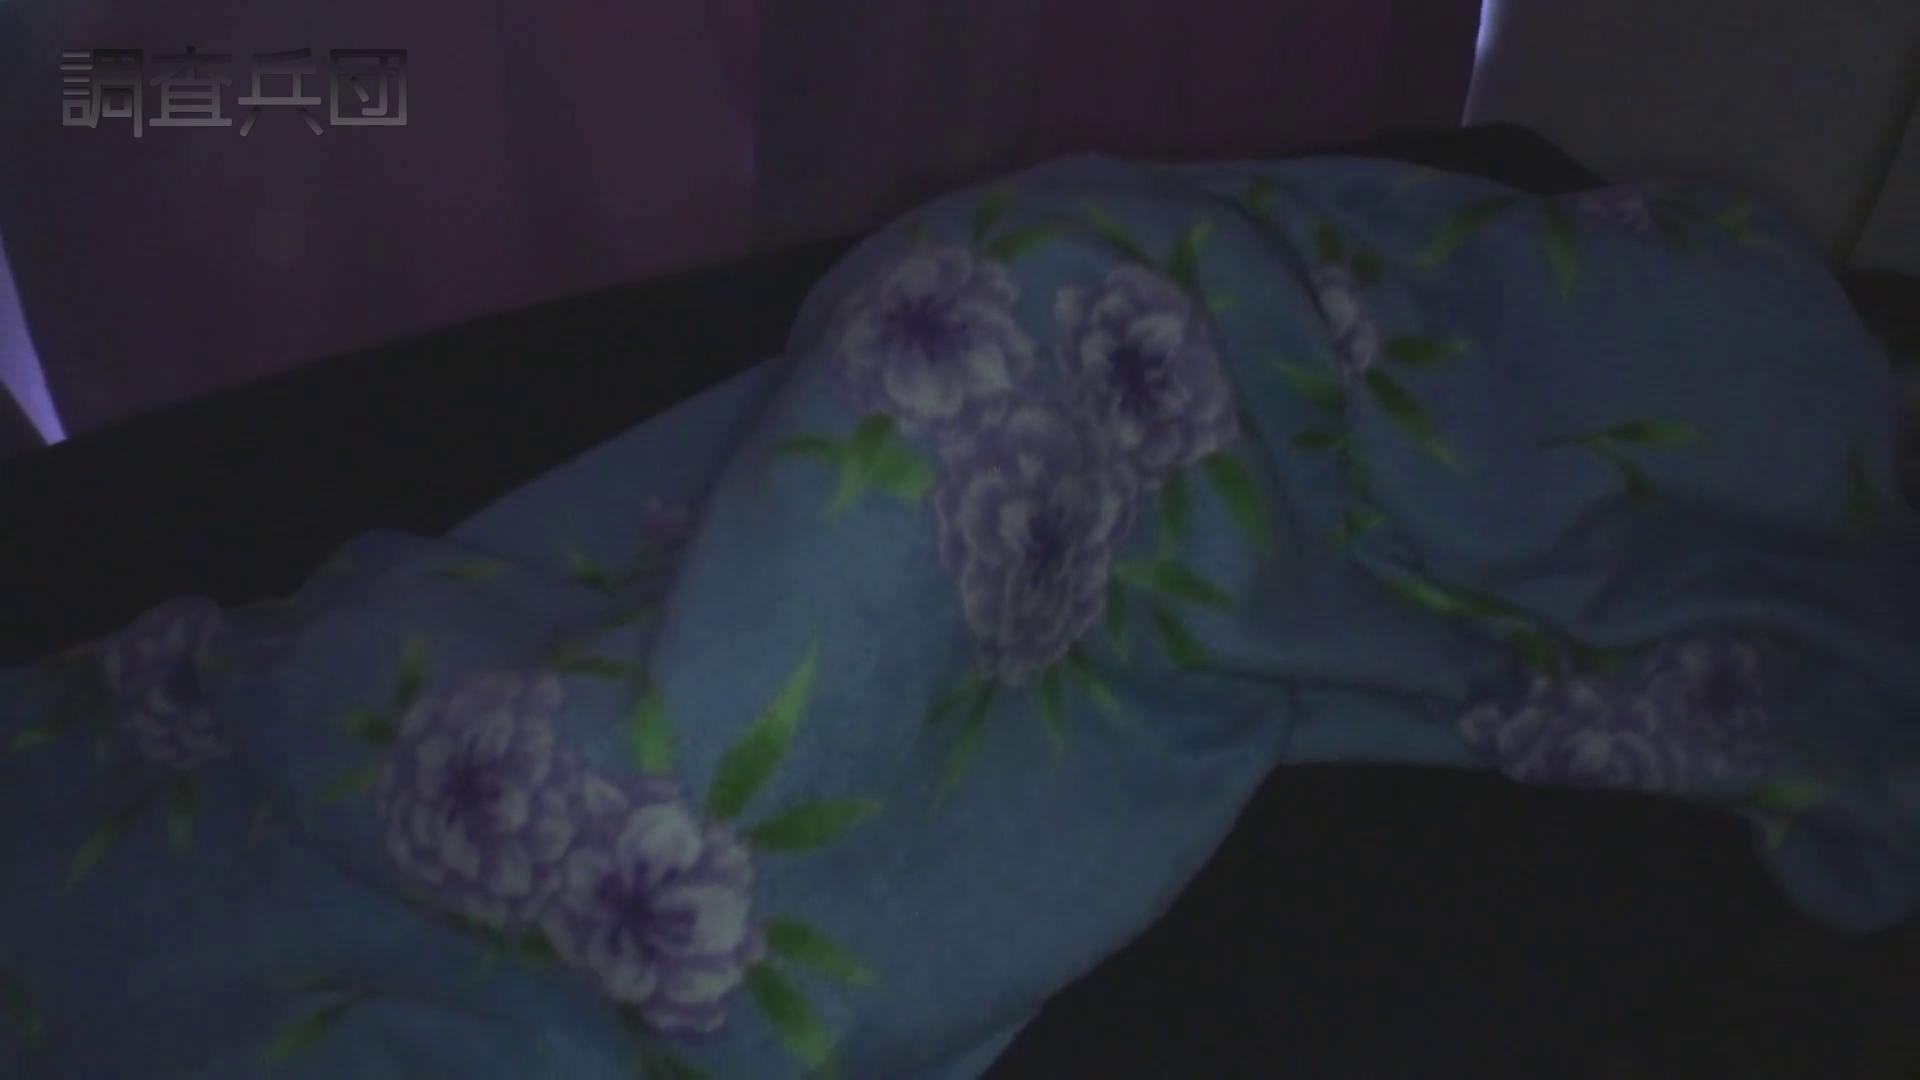 RE:~反撃の悪戯~vol.7 パンケーキ屋バイト・あかり【前編】 反撃の悪戯  60pic 4